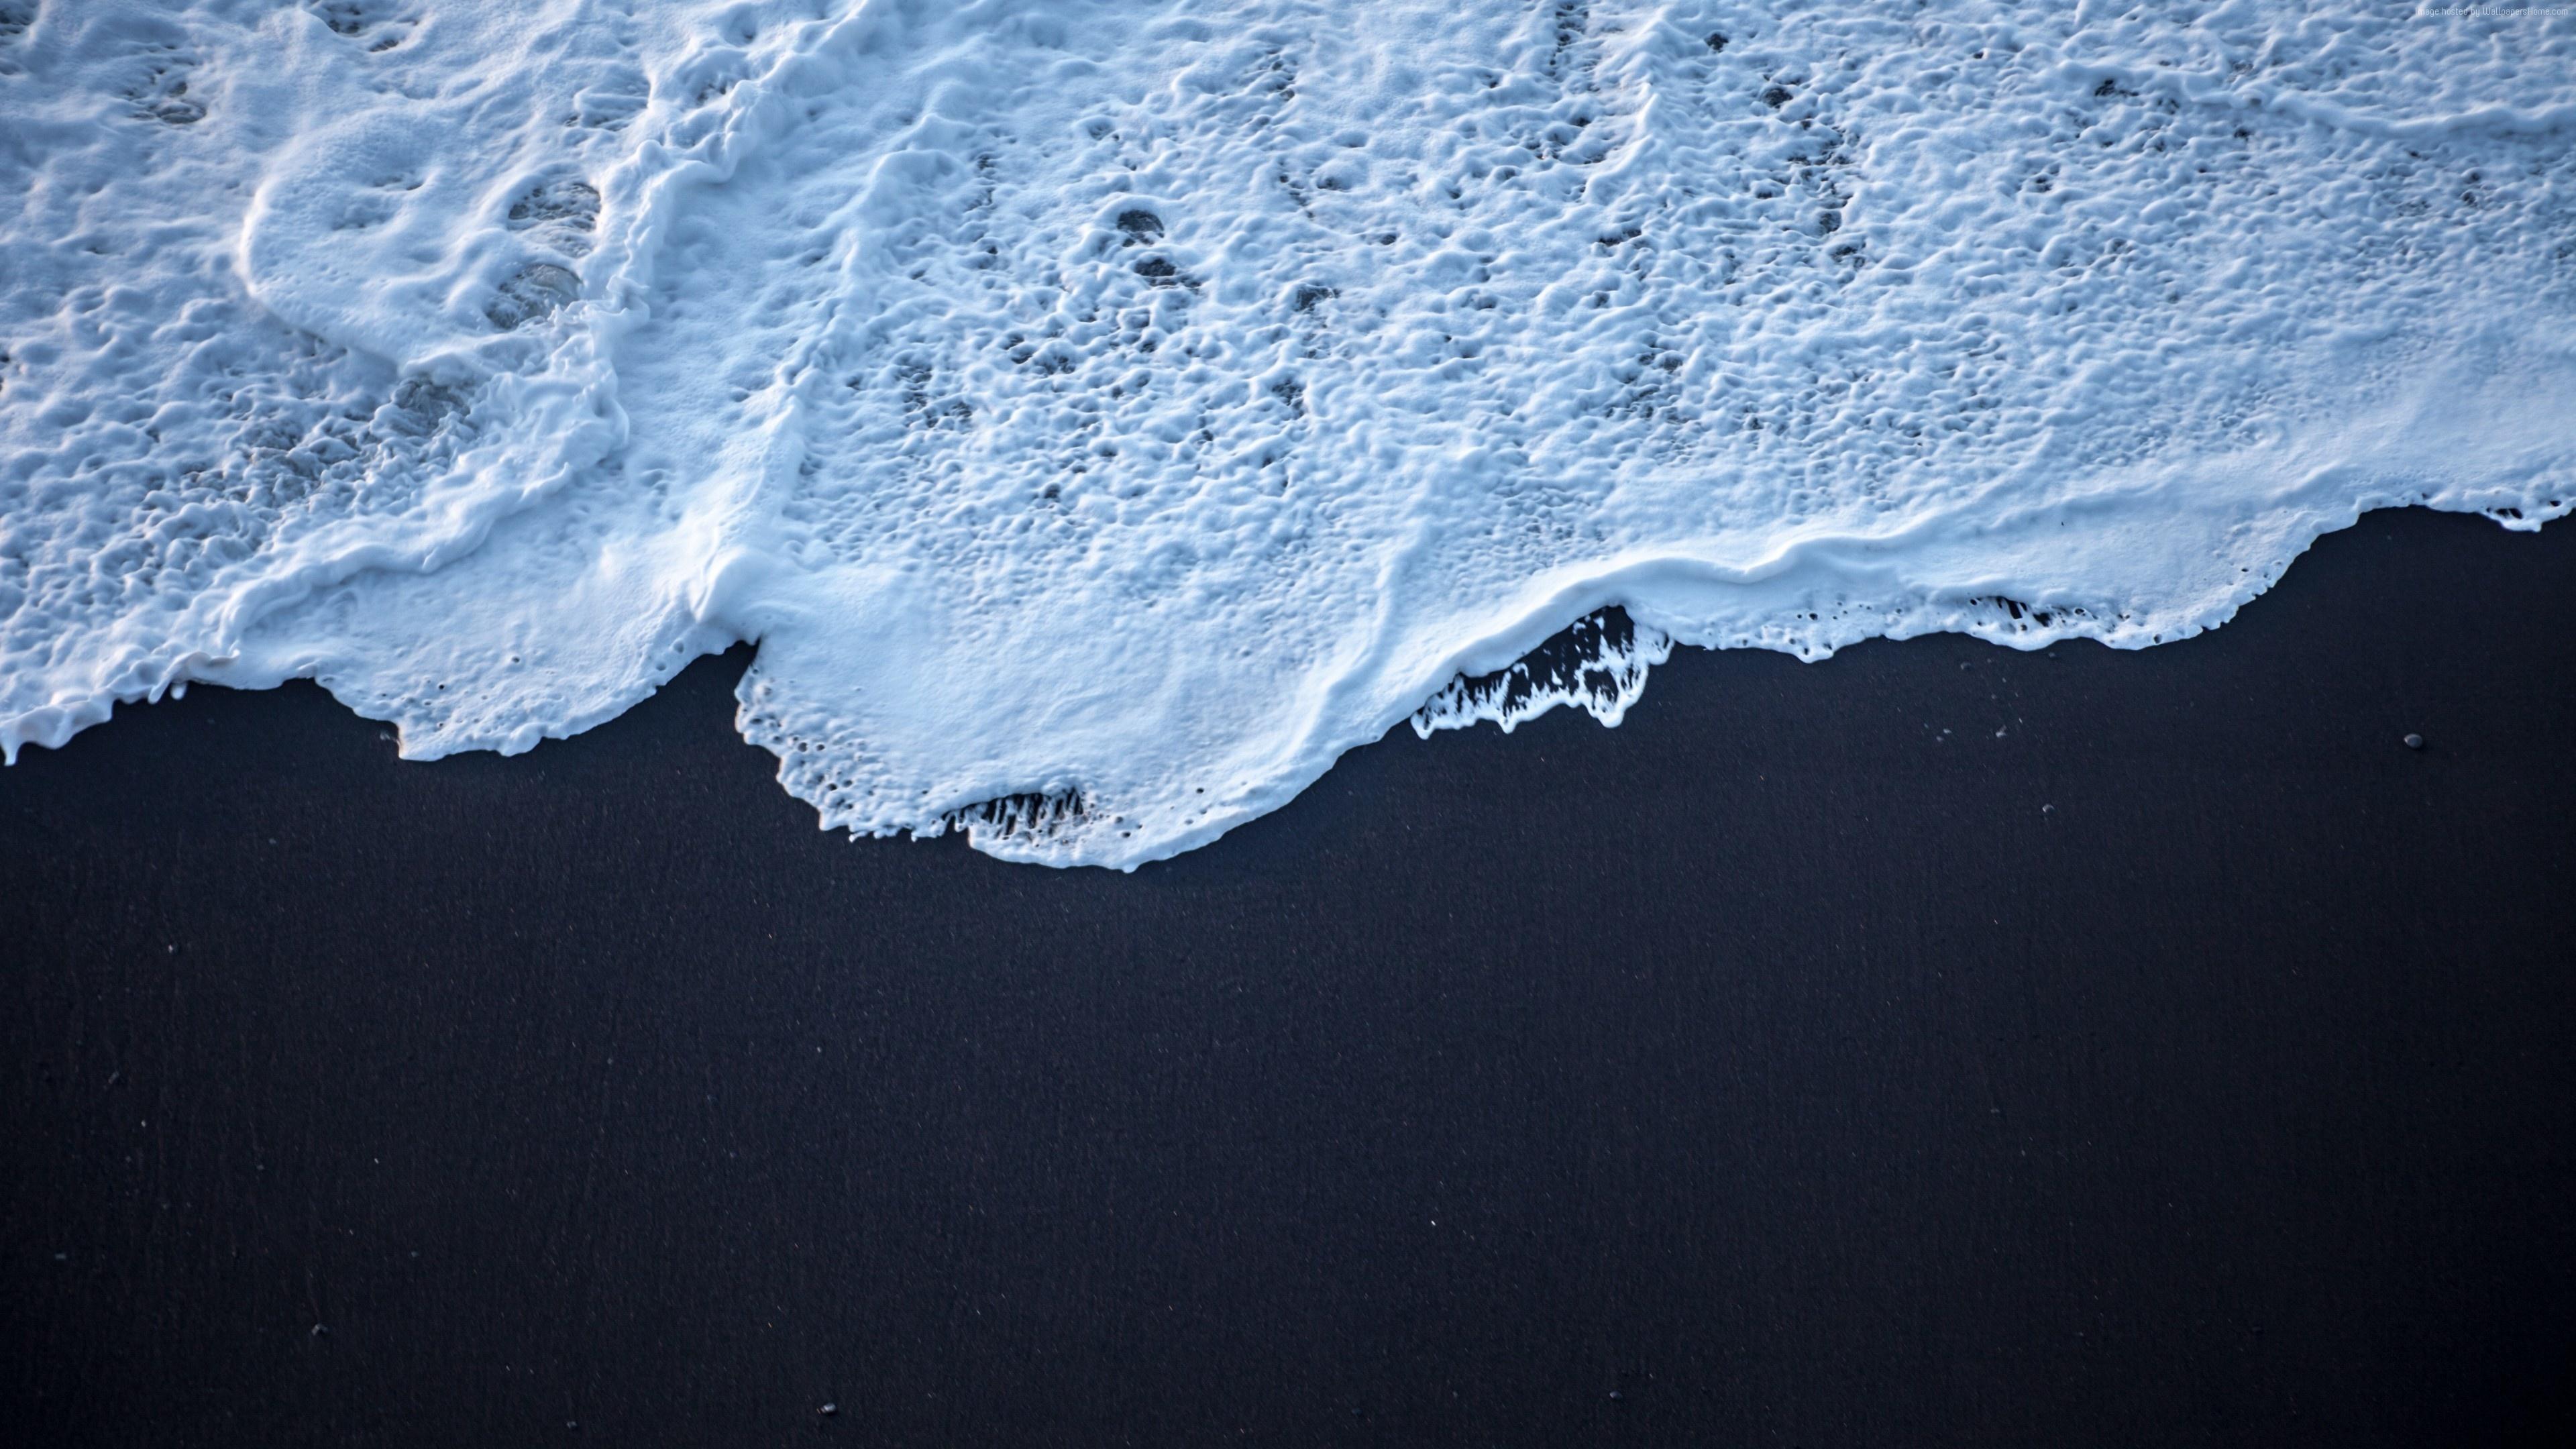 Download 3840x2160 Wallpaper Black Beach Sea Waves Close Up 4k Uhd 16 9 Widescreen 3840x2160 Hd Image Background 16367